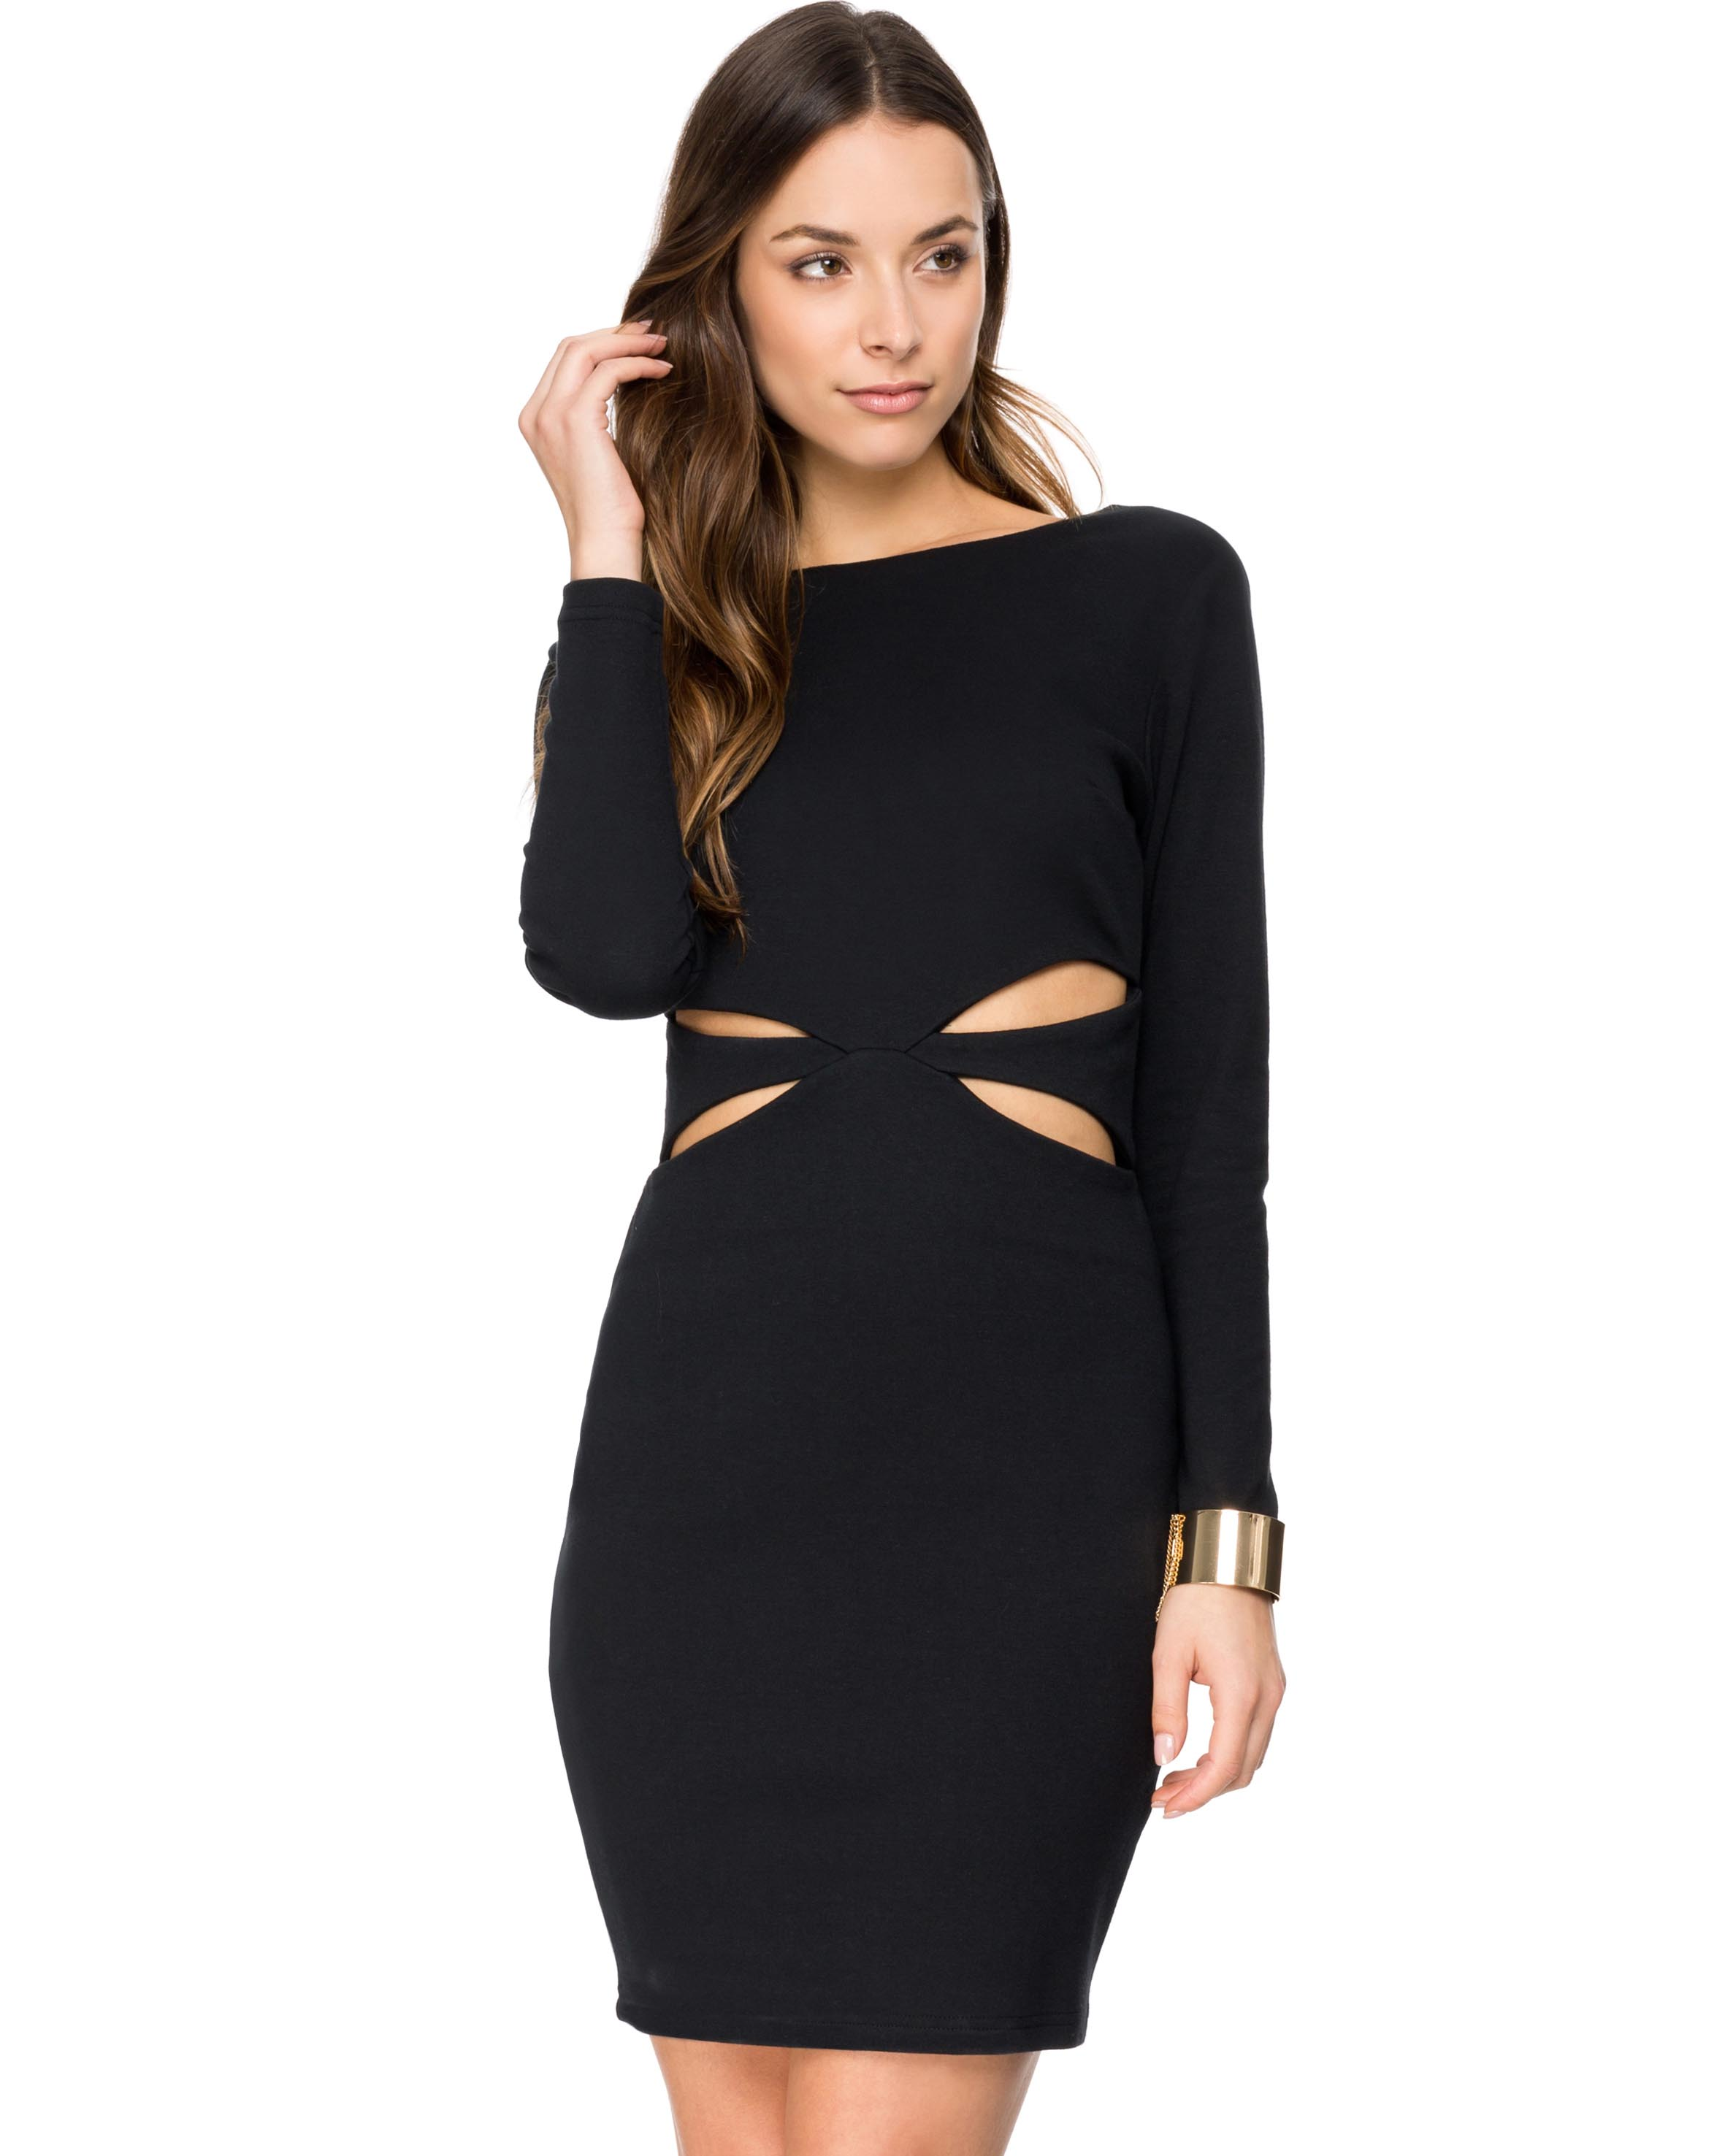 Australian Online, Australian Fashion, Clothing Stores, Clothing Online, Buy Lady, Australia Shops, Fashion Australian, Fashion Boutiques